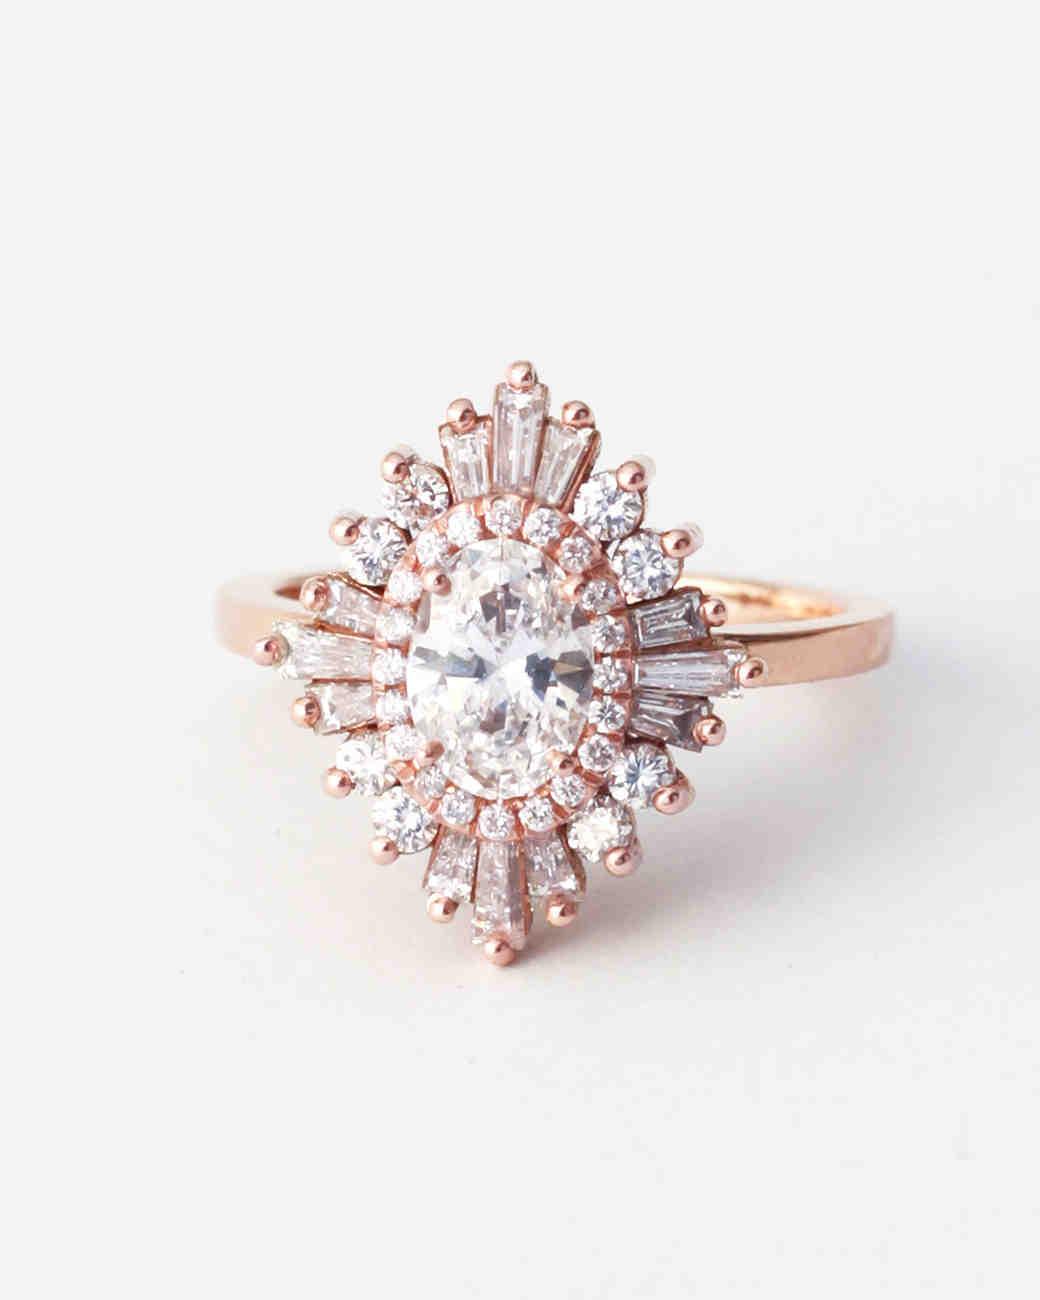 Heidi Gibson Oval Diamond Art Deco Engagement Ring